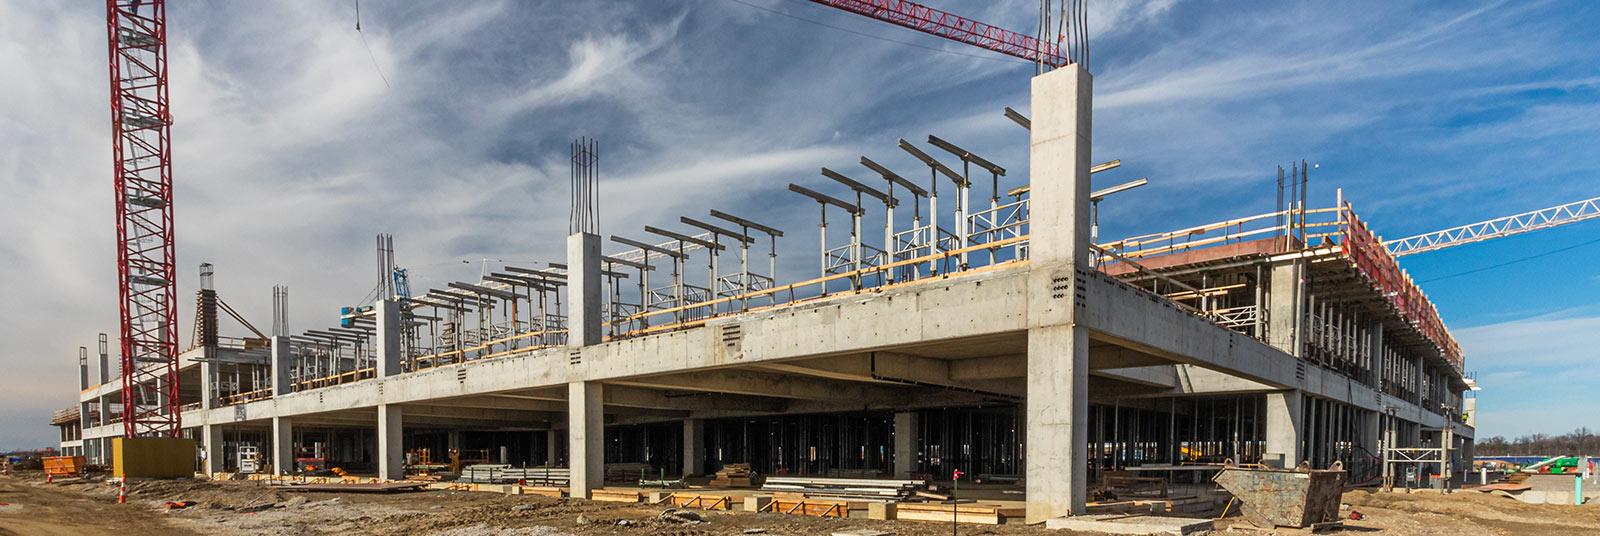 Construction progress at the ConRAC facility at the John Glenn Columbus International Airport in Columbus, Ohio.